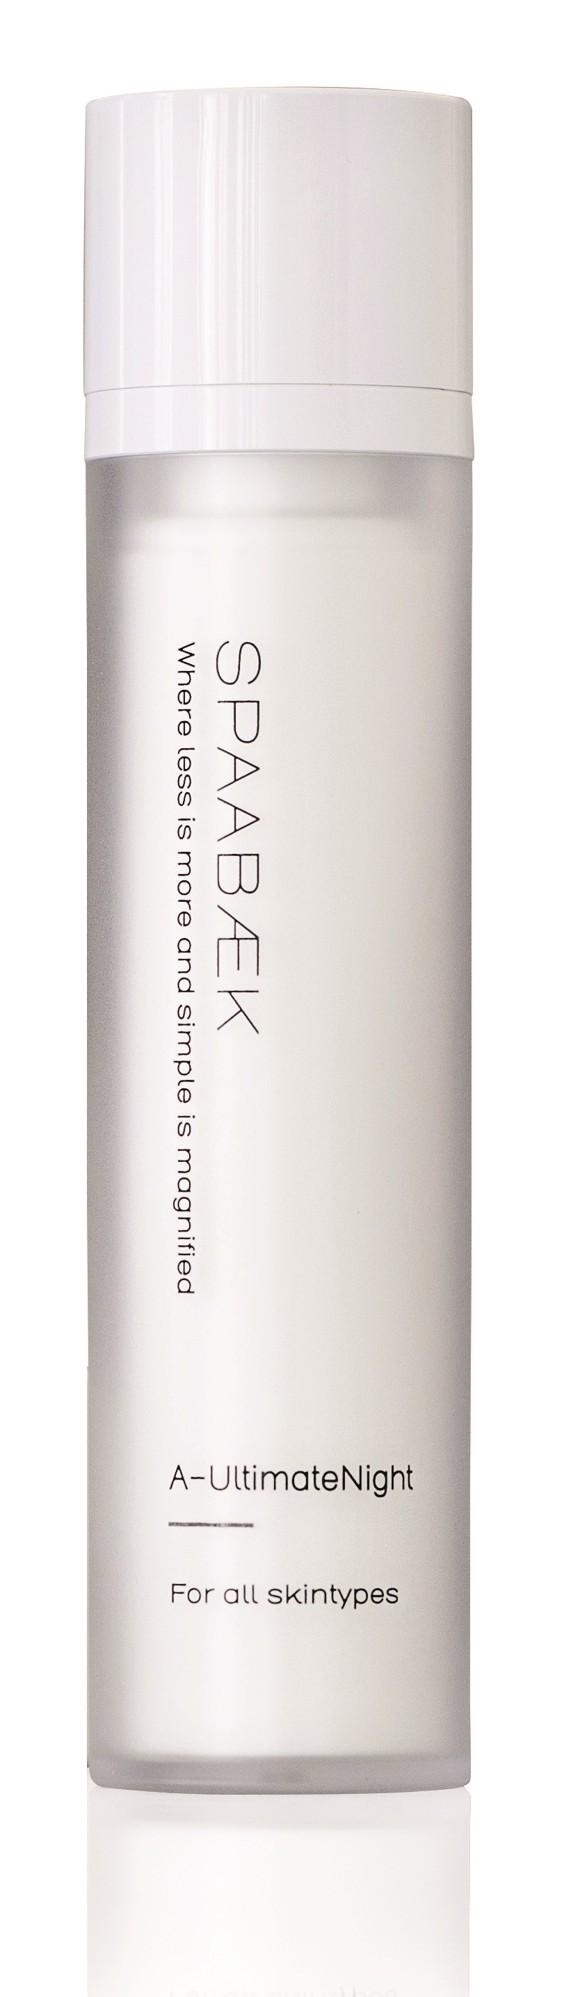 Spaabæk - A-UltimativeNight Cream 50 ml